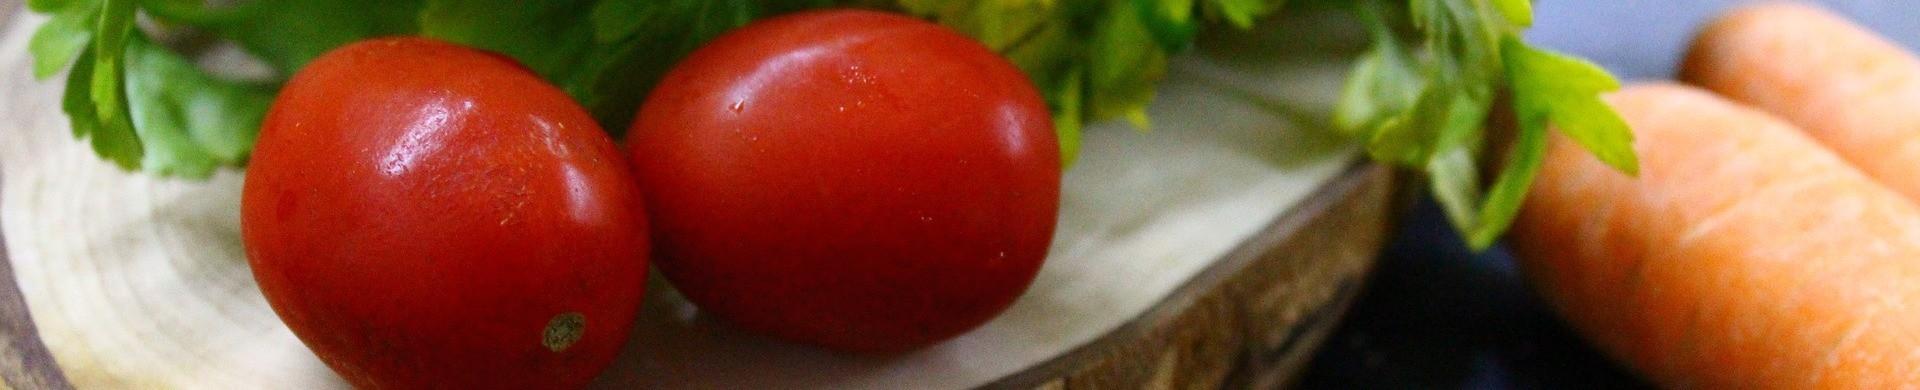 Buy tomato plants - Plants or tomato bushes online